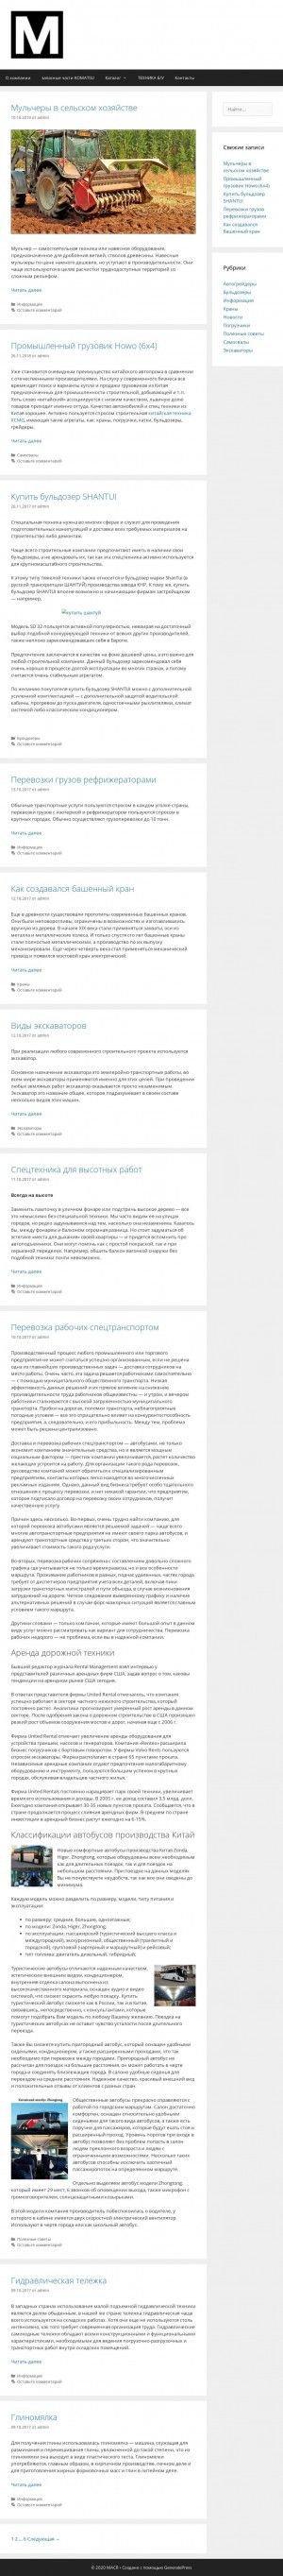 Предпросмотр для www.macr.ru — Марубени Авто и Строительная Техника